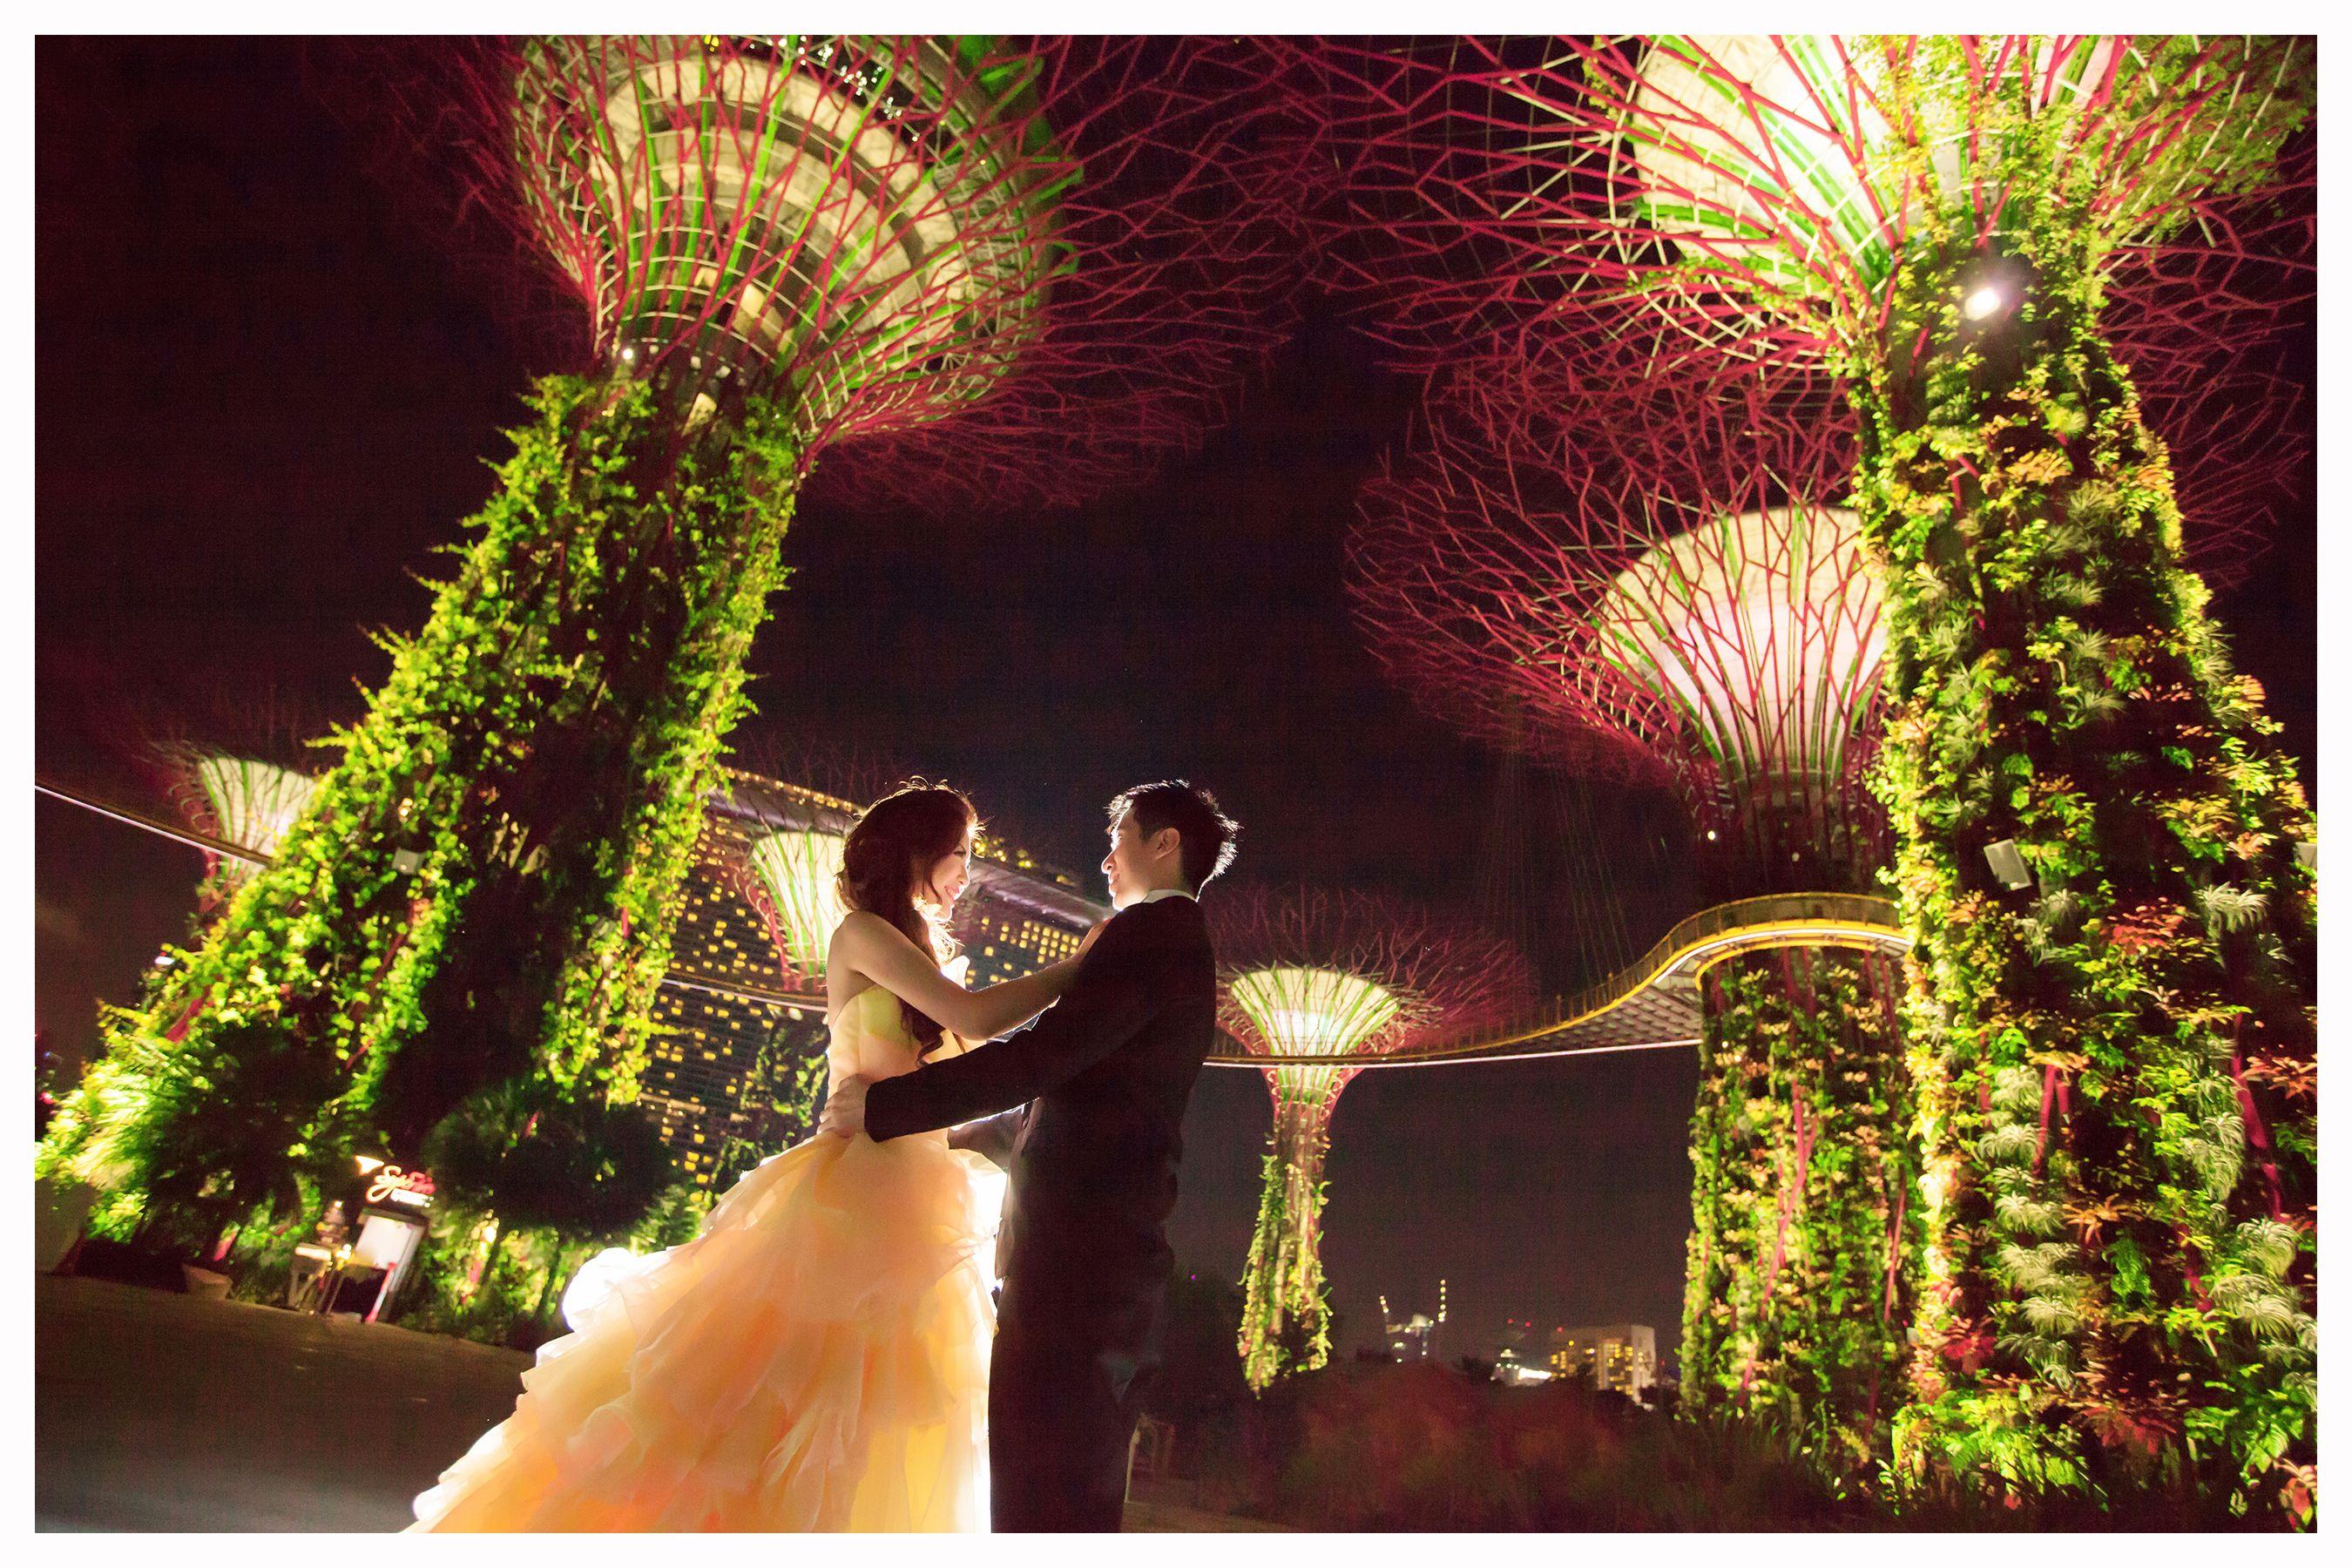 Must Have Photos With Your Groom Bluebay Wedding Singapore Prewedding Photography Romantic Couple Poses Wedding Photoshoot